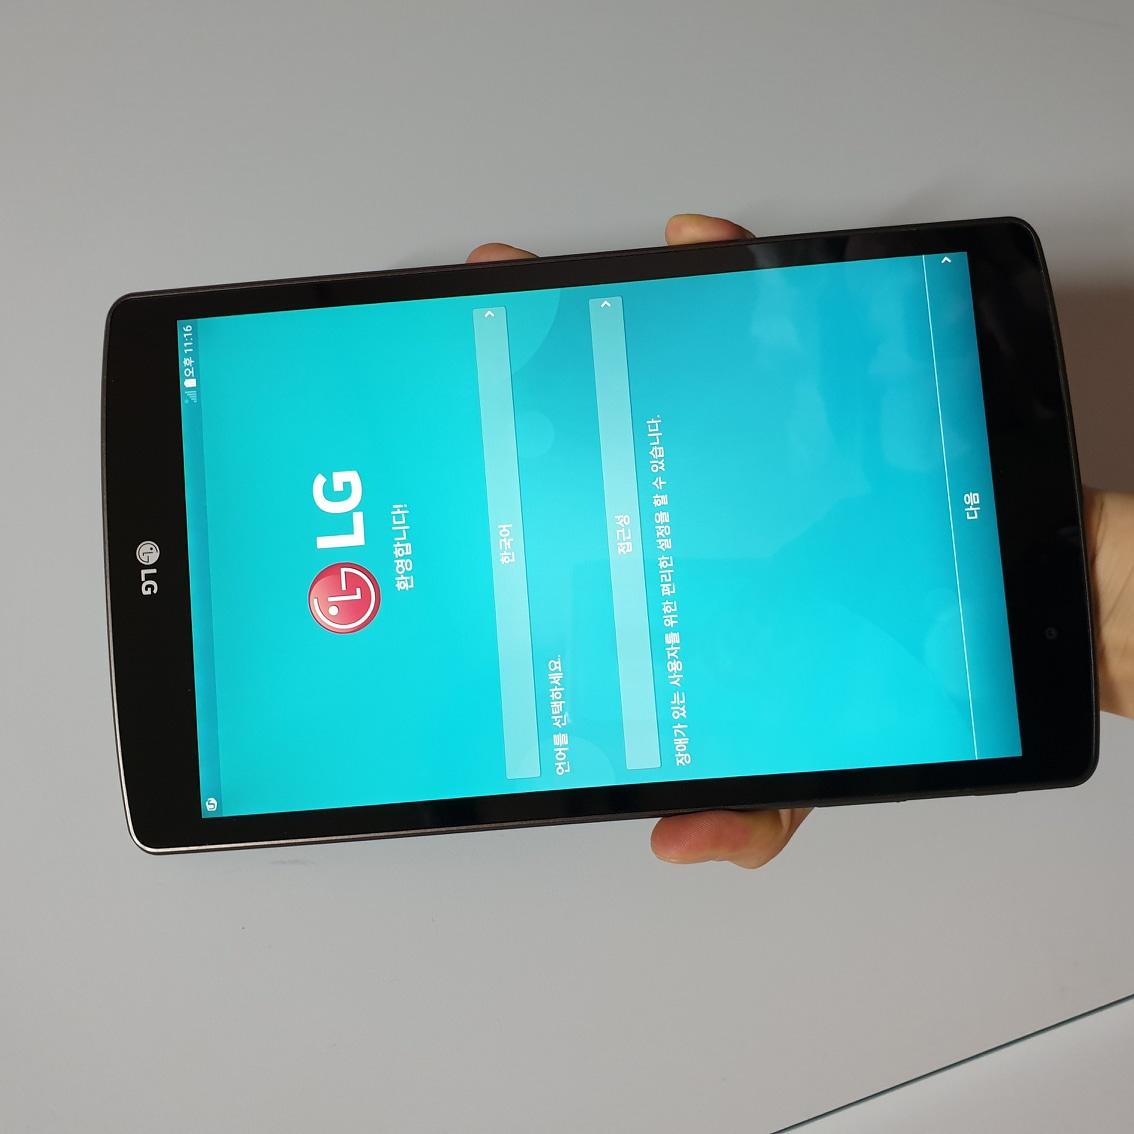 LG태블릿 P815L LTE 팝니다 (초기화,정상해지O)